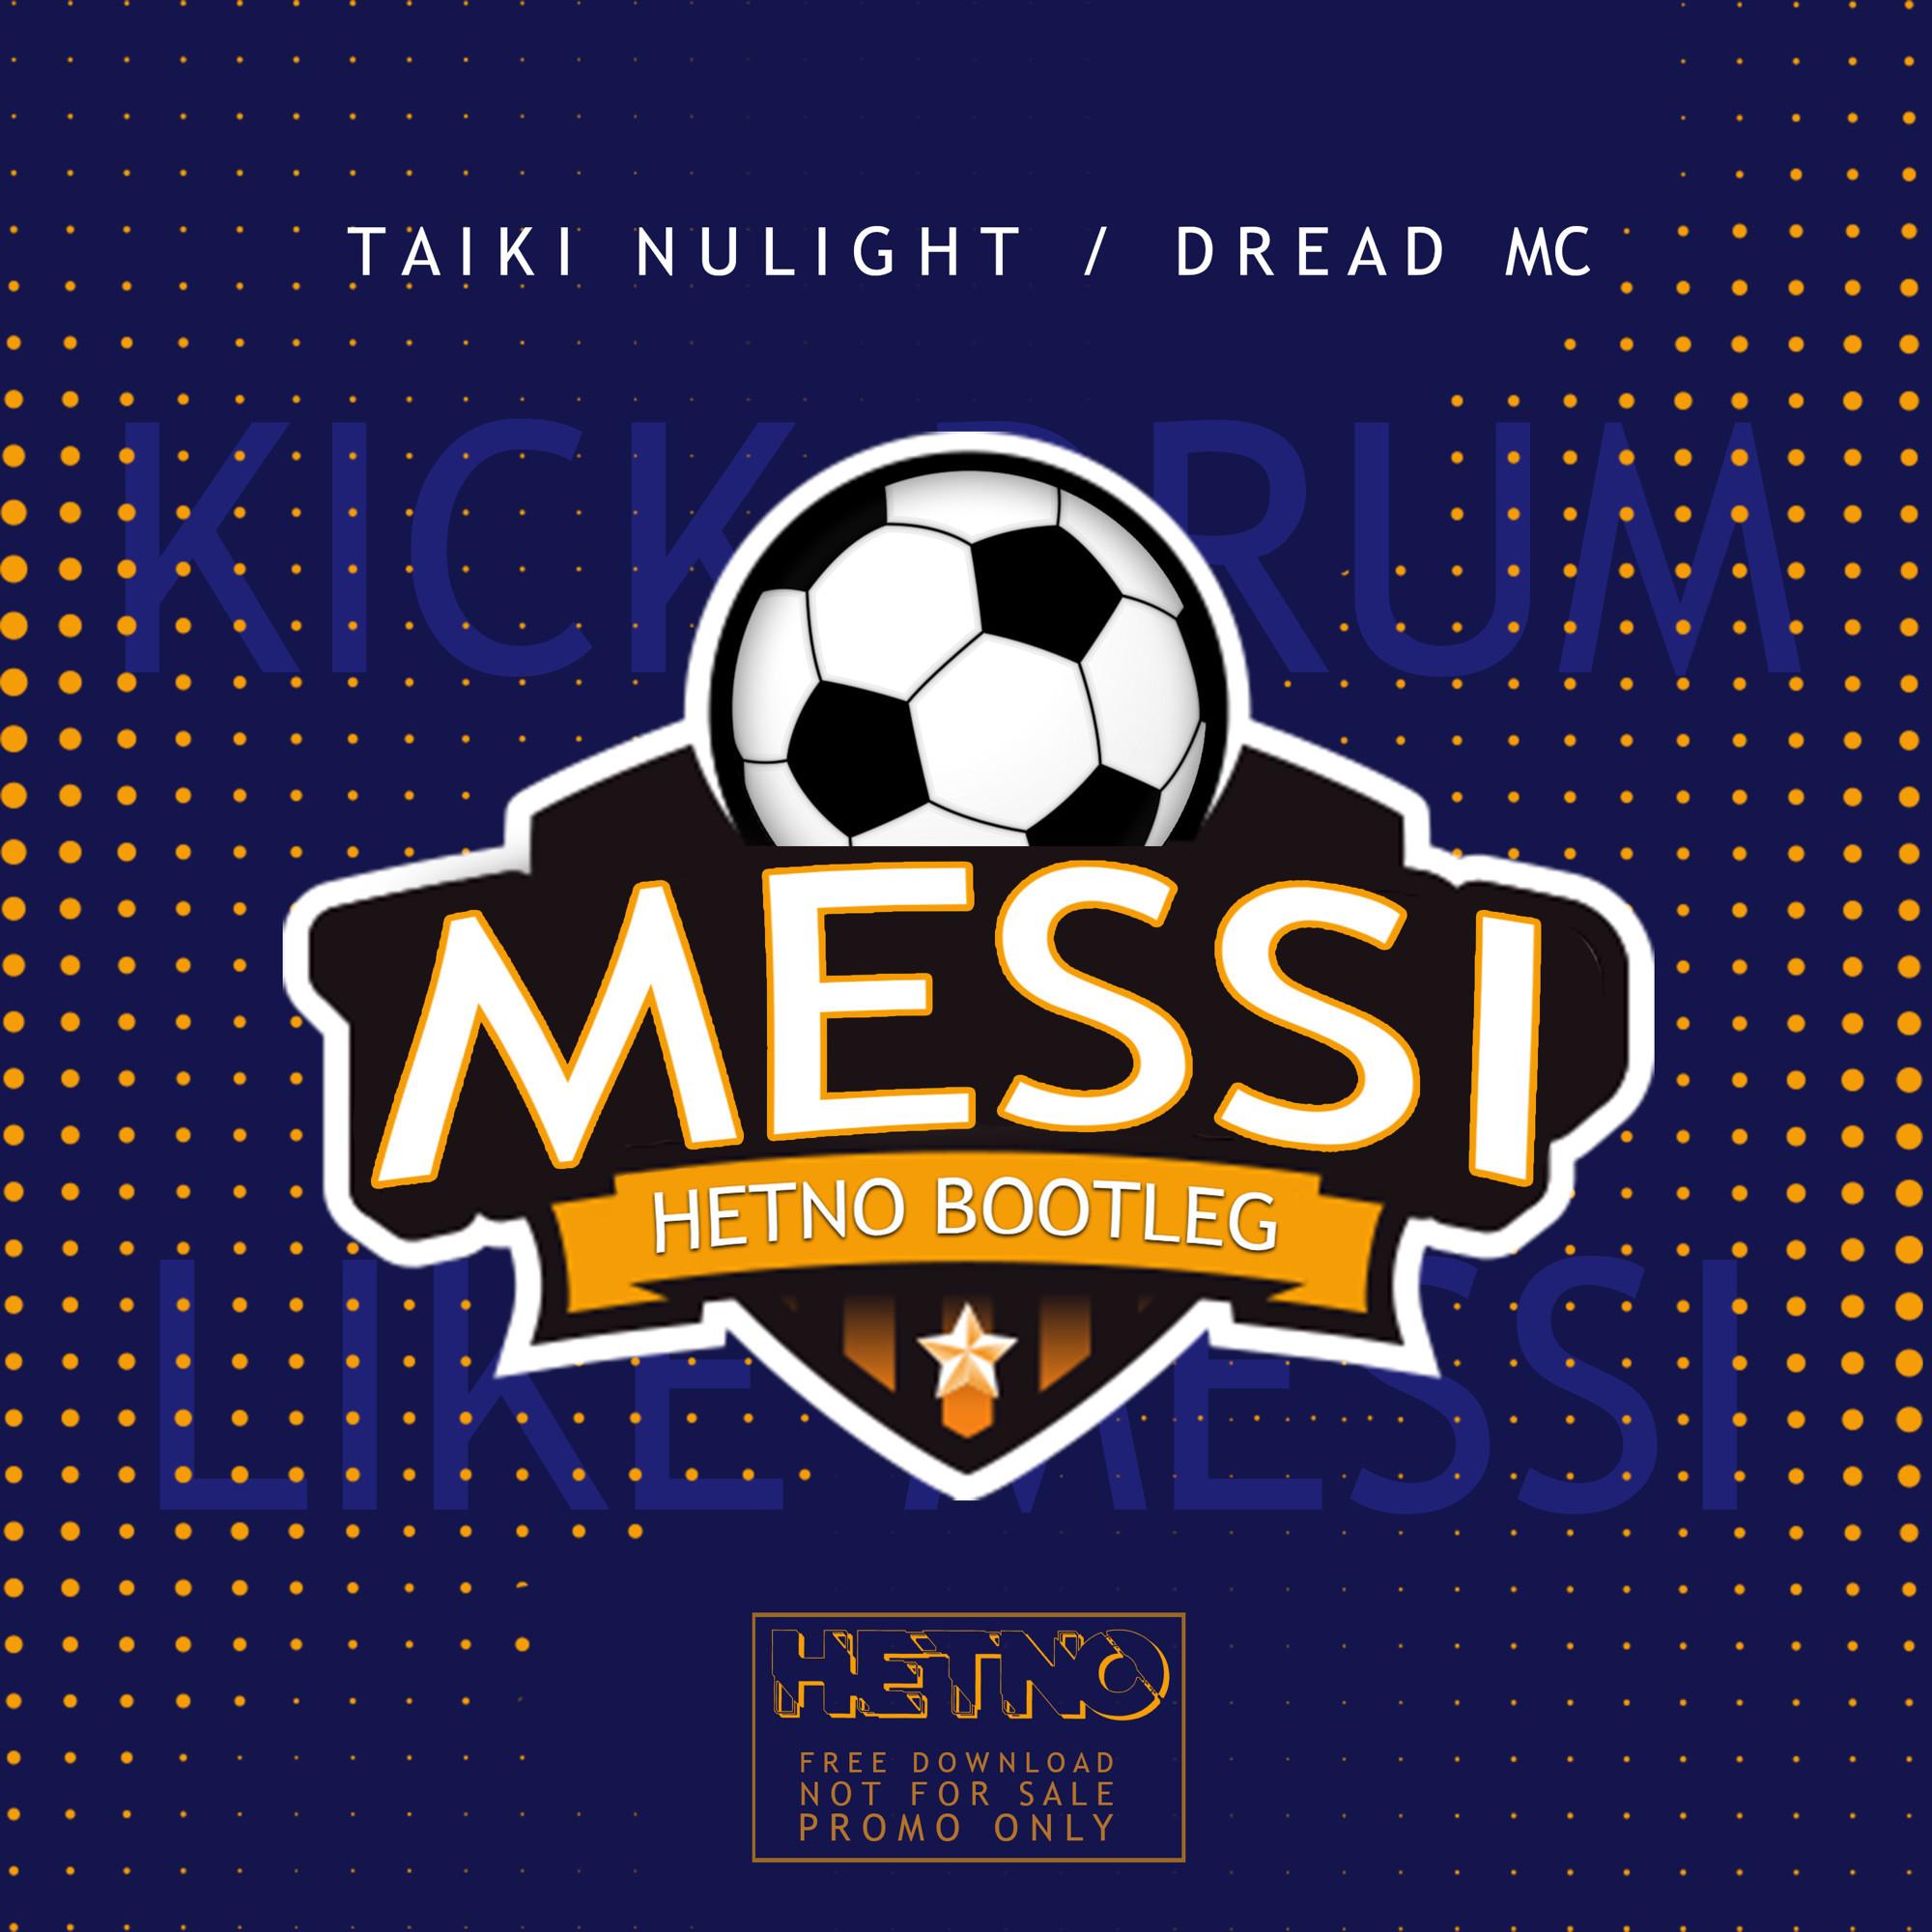 TAIKI NULIGHT & DREAD MC - MESSI (HETNO RADIO BOOTLEG)